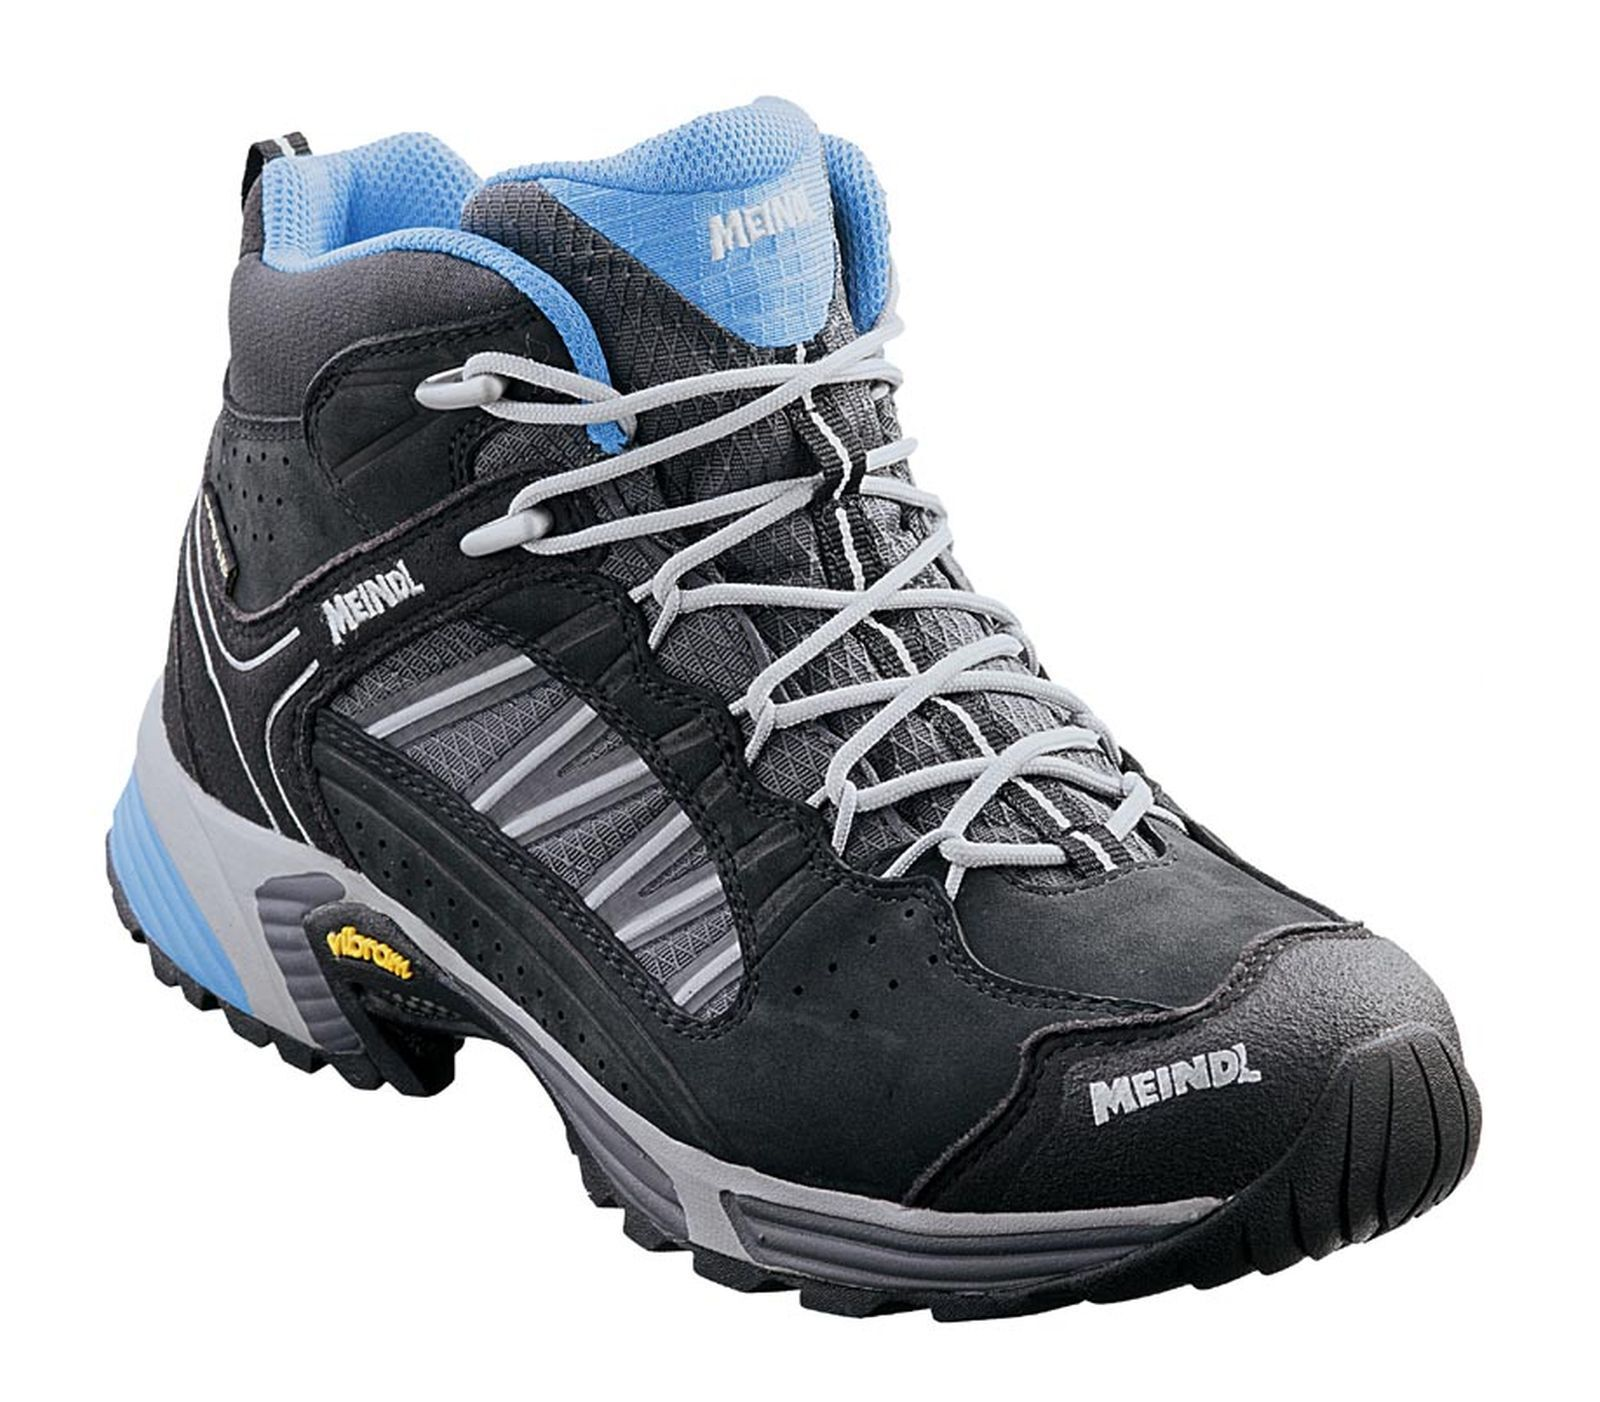 Meindl women Trekking - Randonnée Randonnée Randonnée - Chaussure SX 1.1 Femme Mid GTX black fe75e1